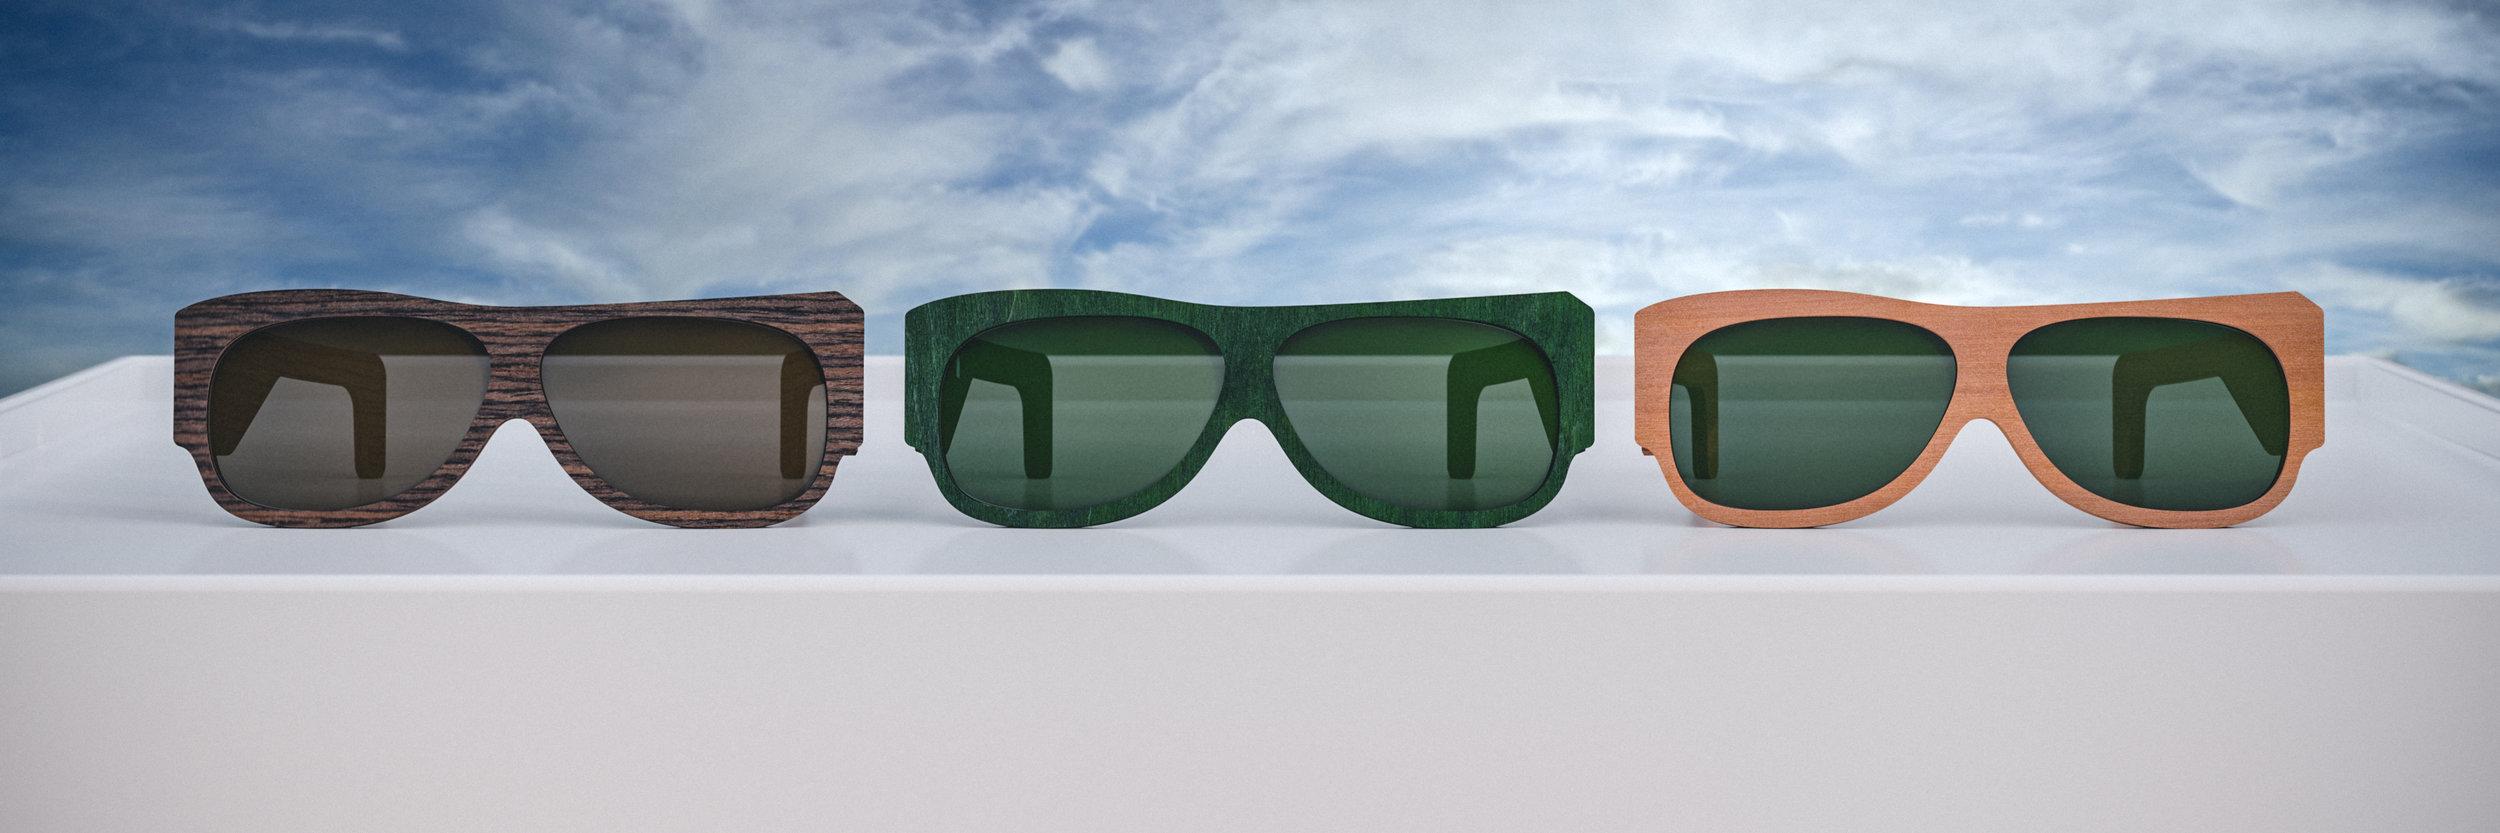 eyewear-cover-2.jpg